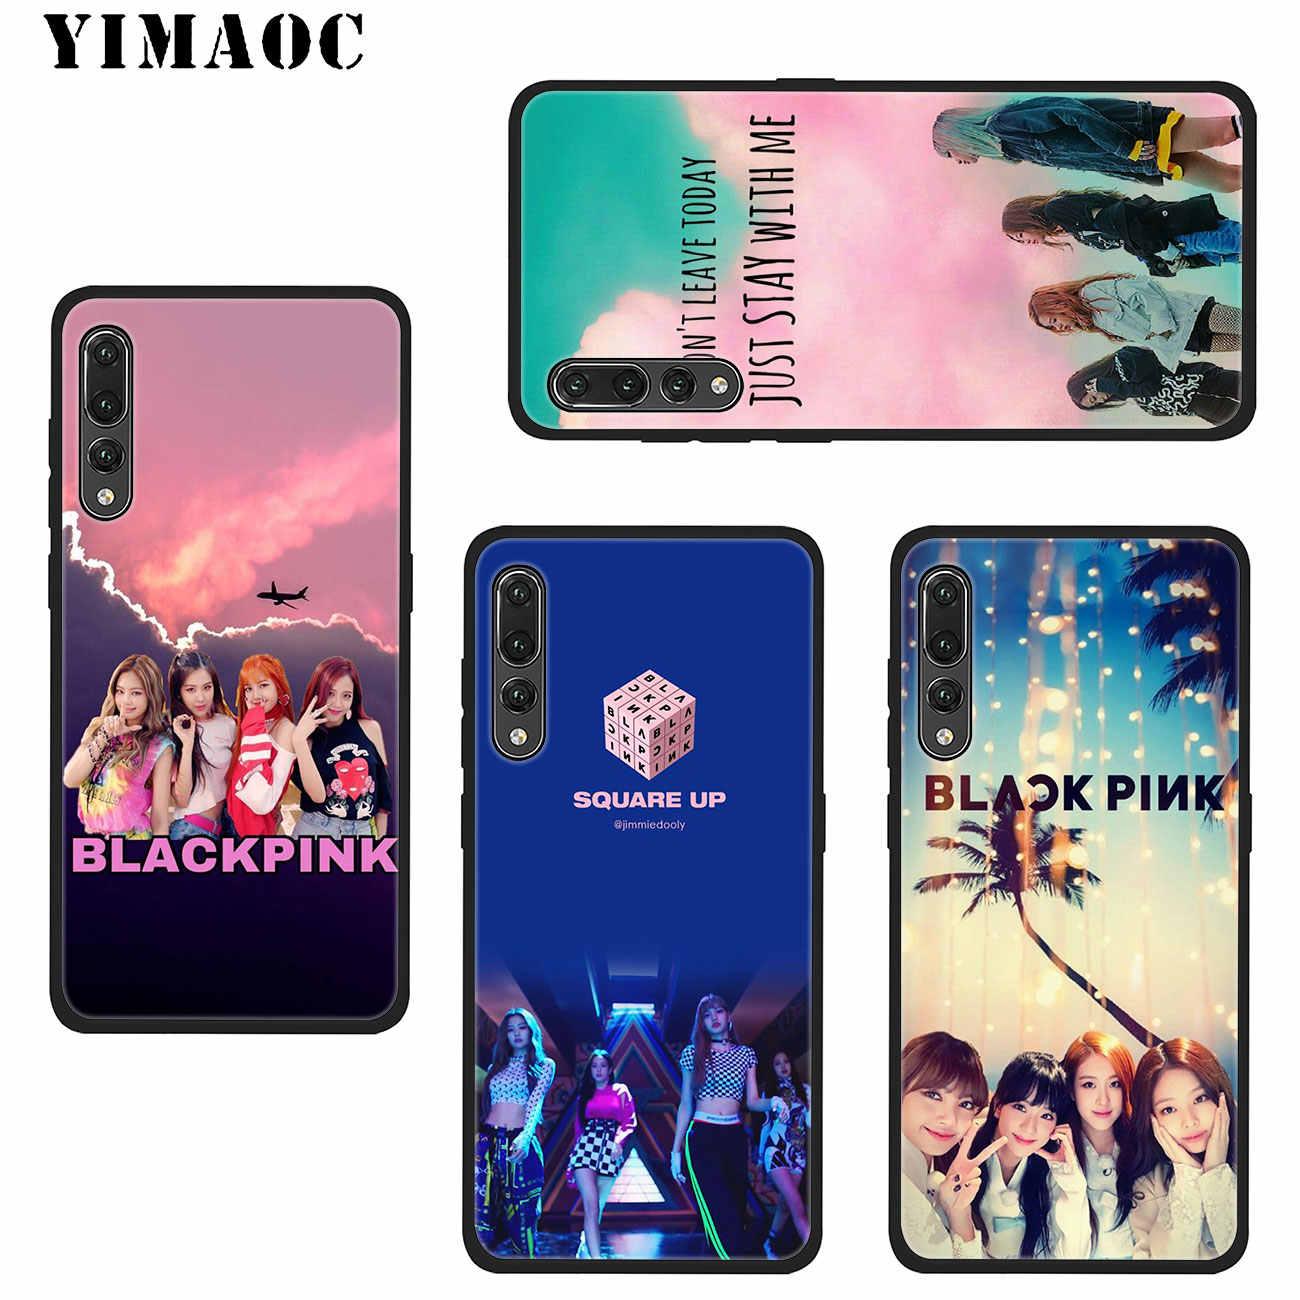 YIMAOC JENNIE BLACKPINK Kpop LISA Soft Silicone Phone Case for Huawei P20  Pro P10 P9 P8 Lite Mini 2017 P Smart 2019 TPU Cover